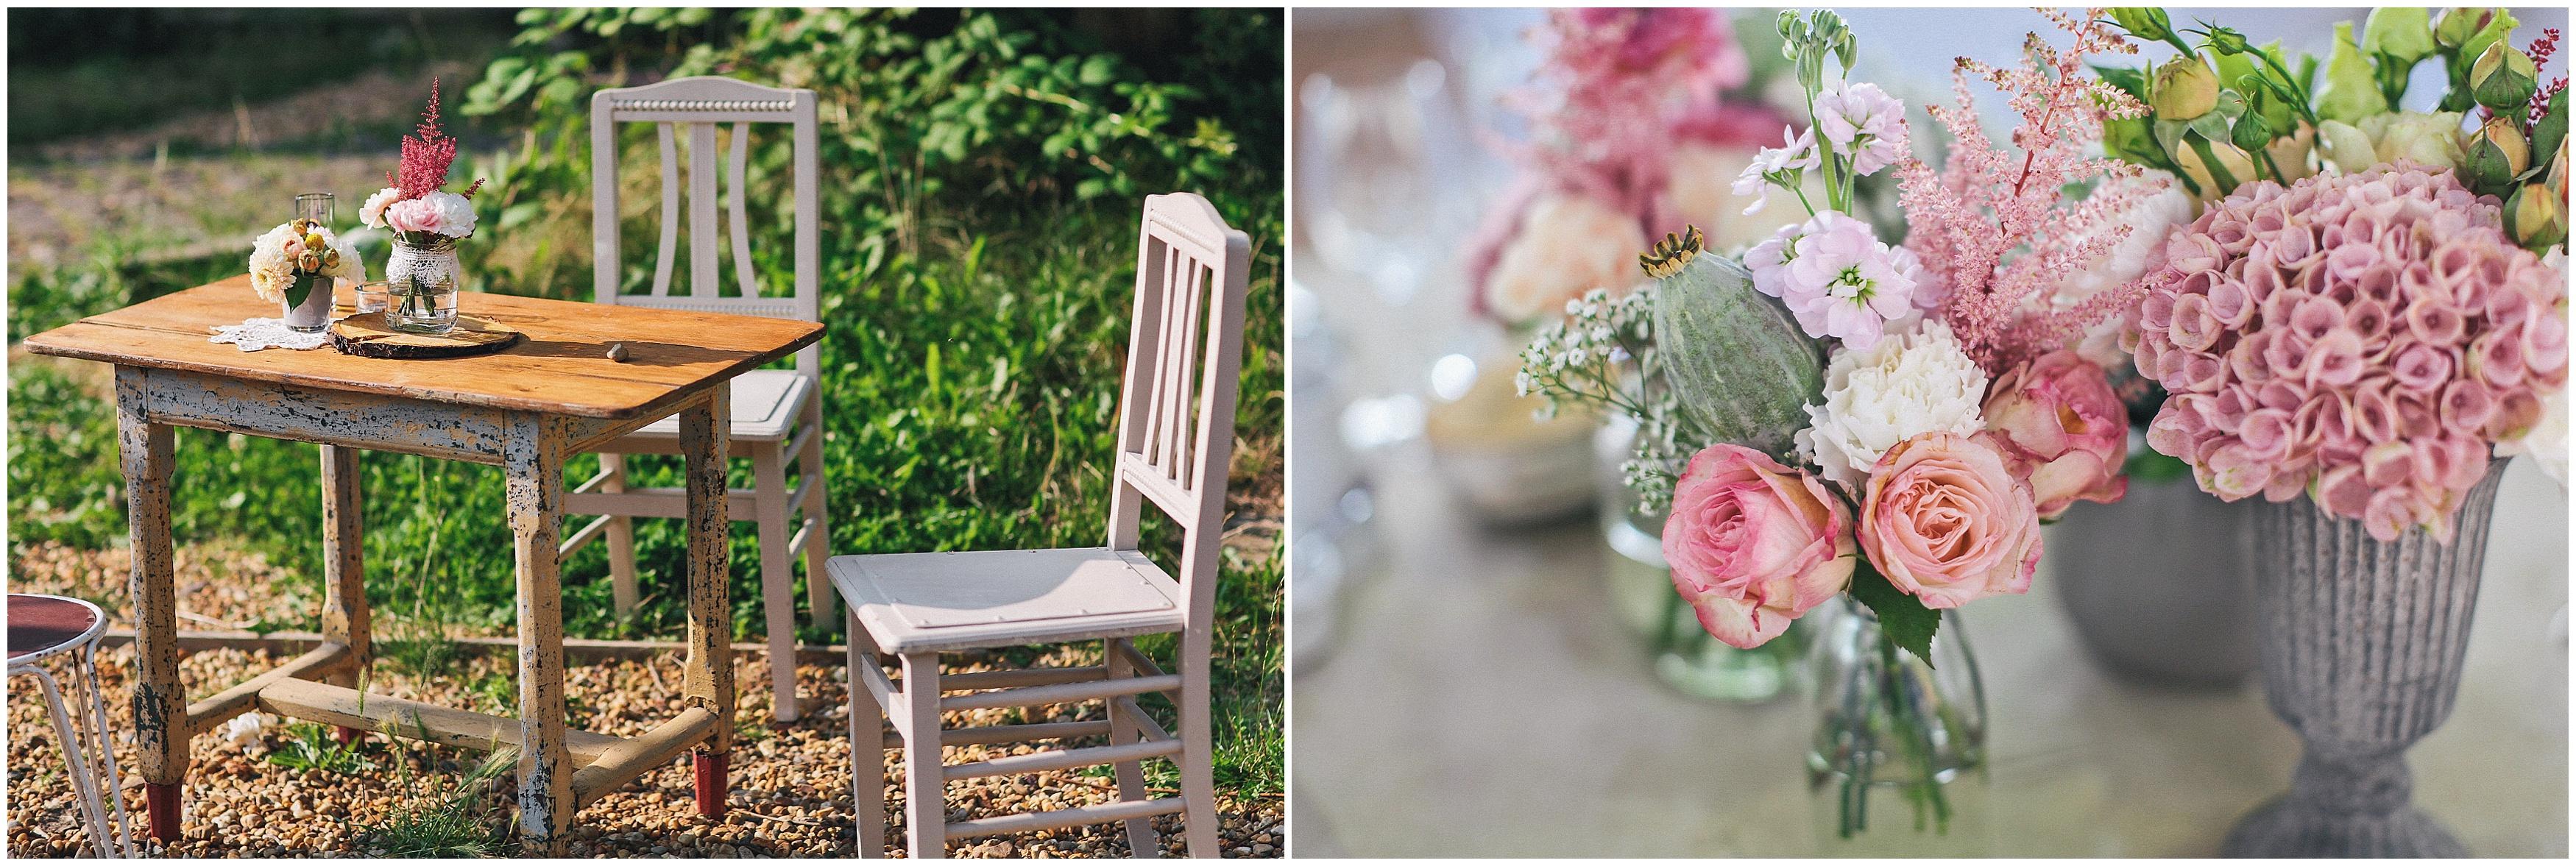 ivy&olive_Hochzeitsplanung_Nancy_Ebert_Fotografie_Vintage_Wedding_0035